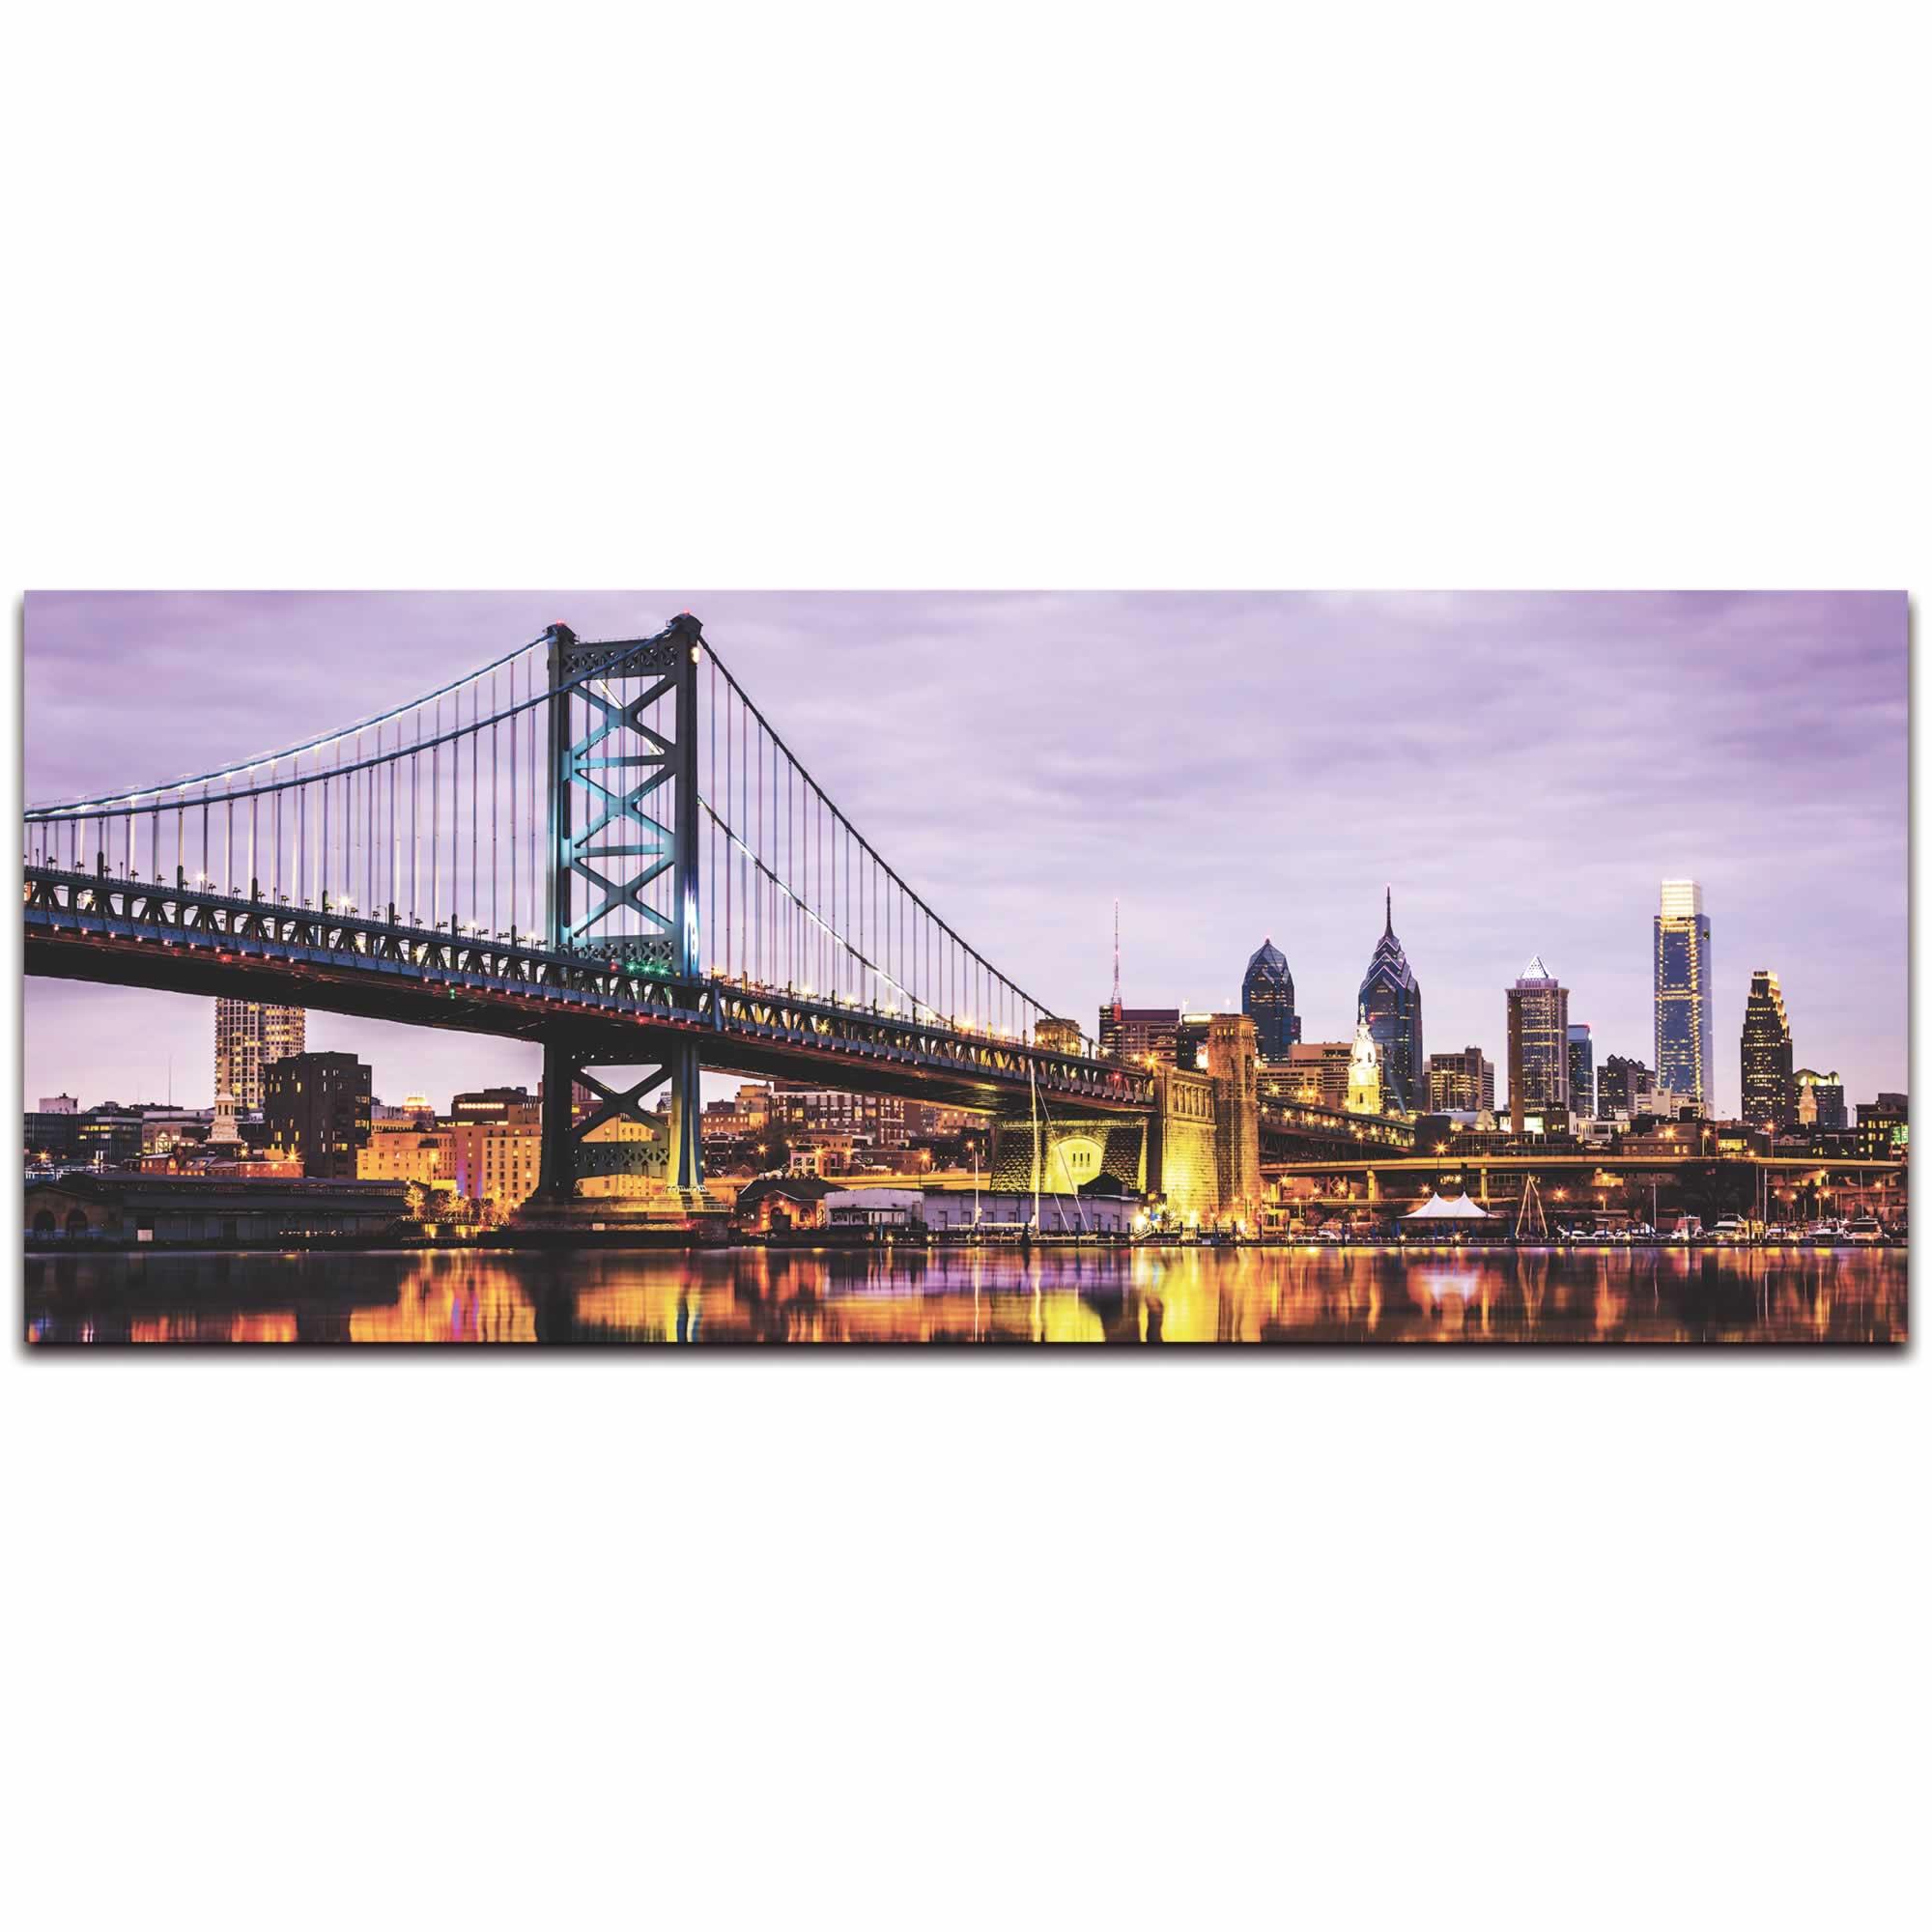 Philadelphia City Skyline - Urban Modern Art, Designer Home Decor, Cityscape Wall Artwork, Trendy Contemporary Art - Alternate View 2